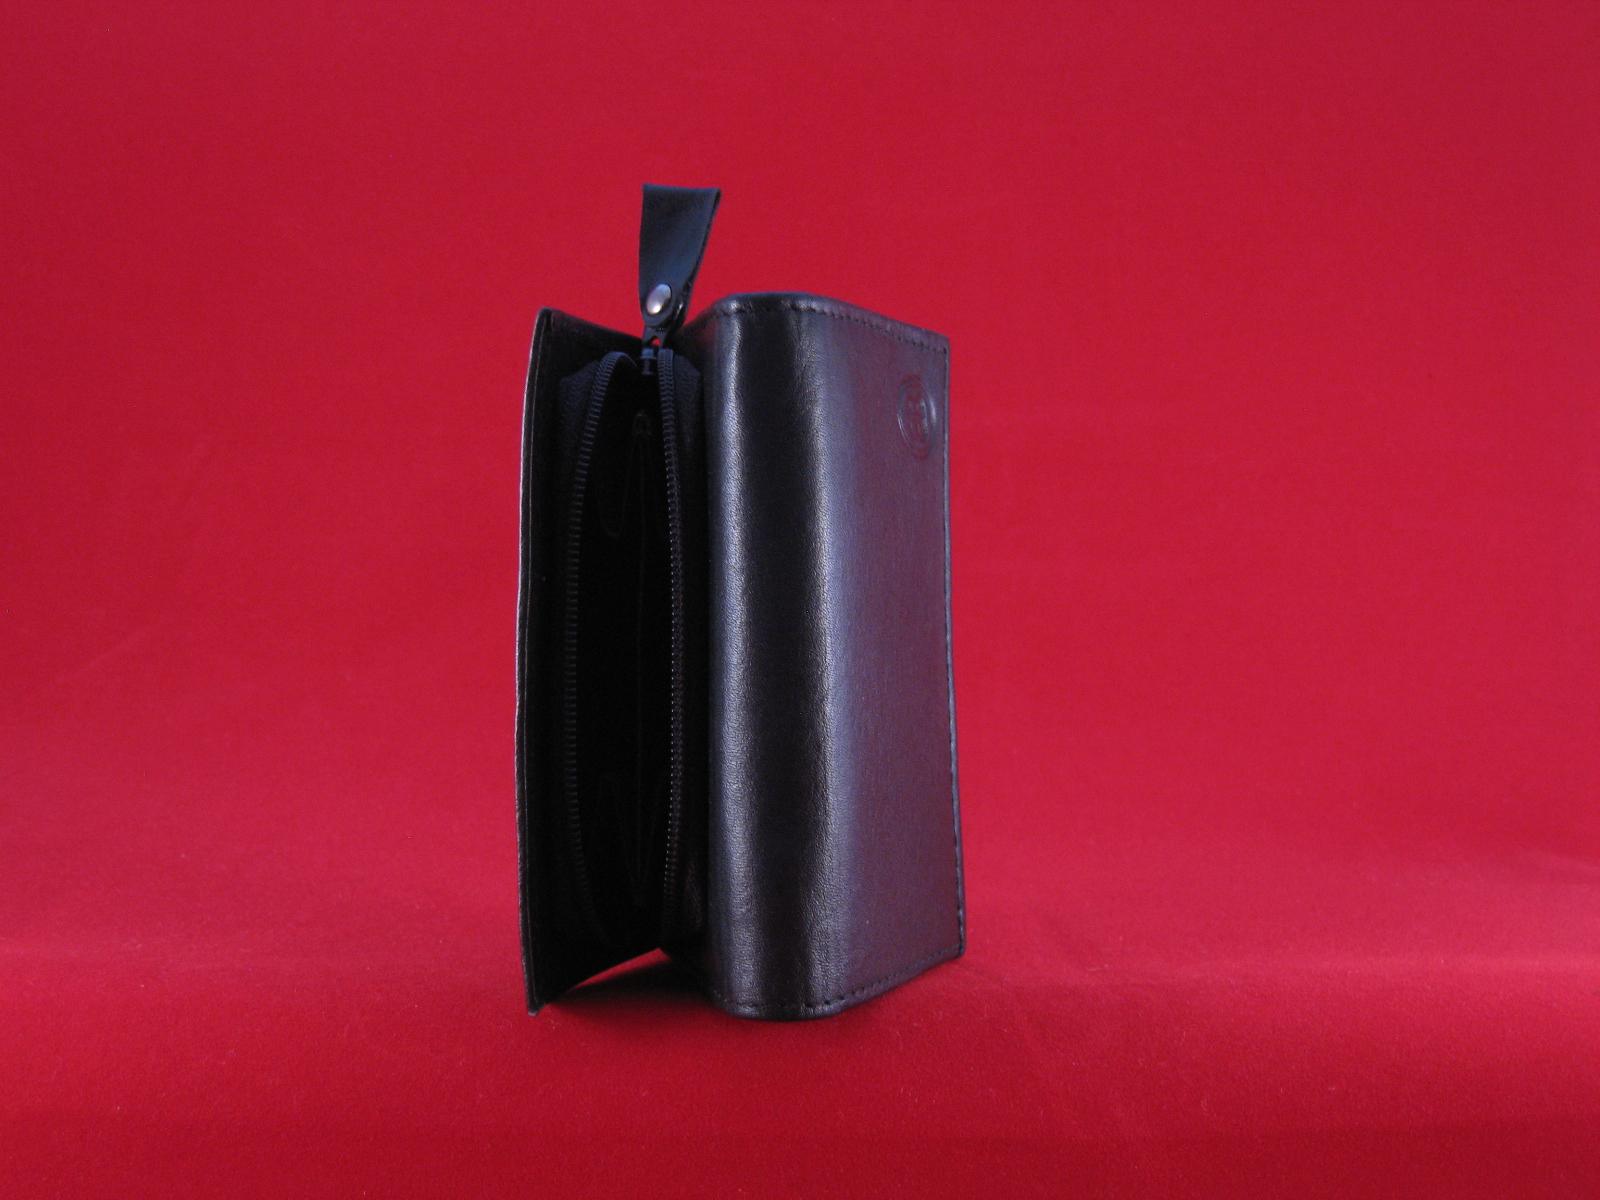 LB 017 svart